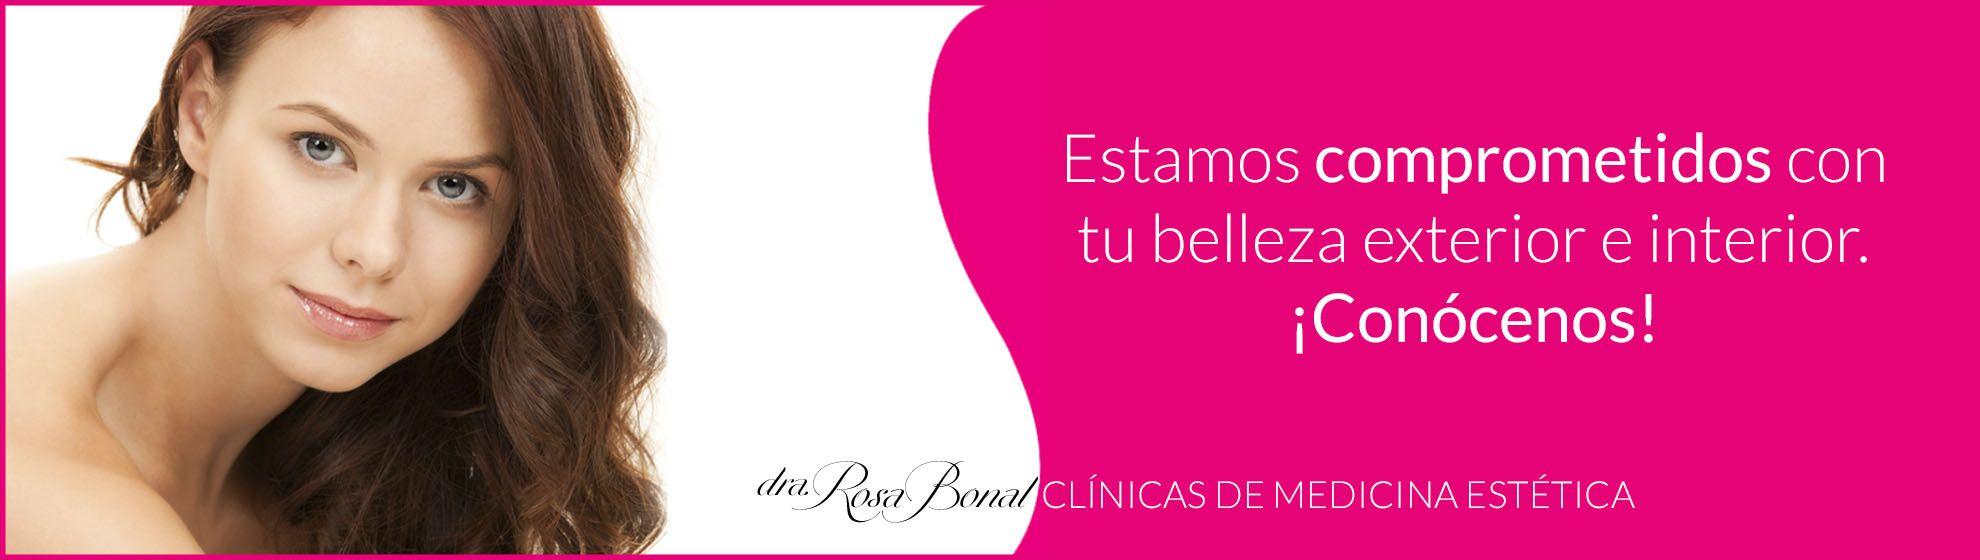 Doctora Rosa Bonal